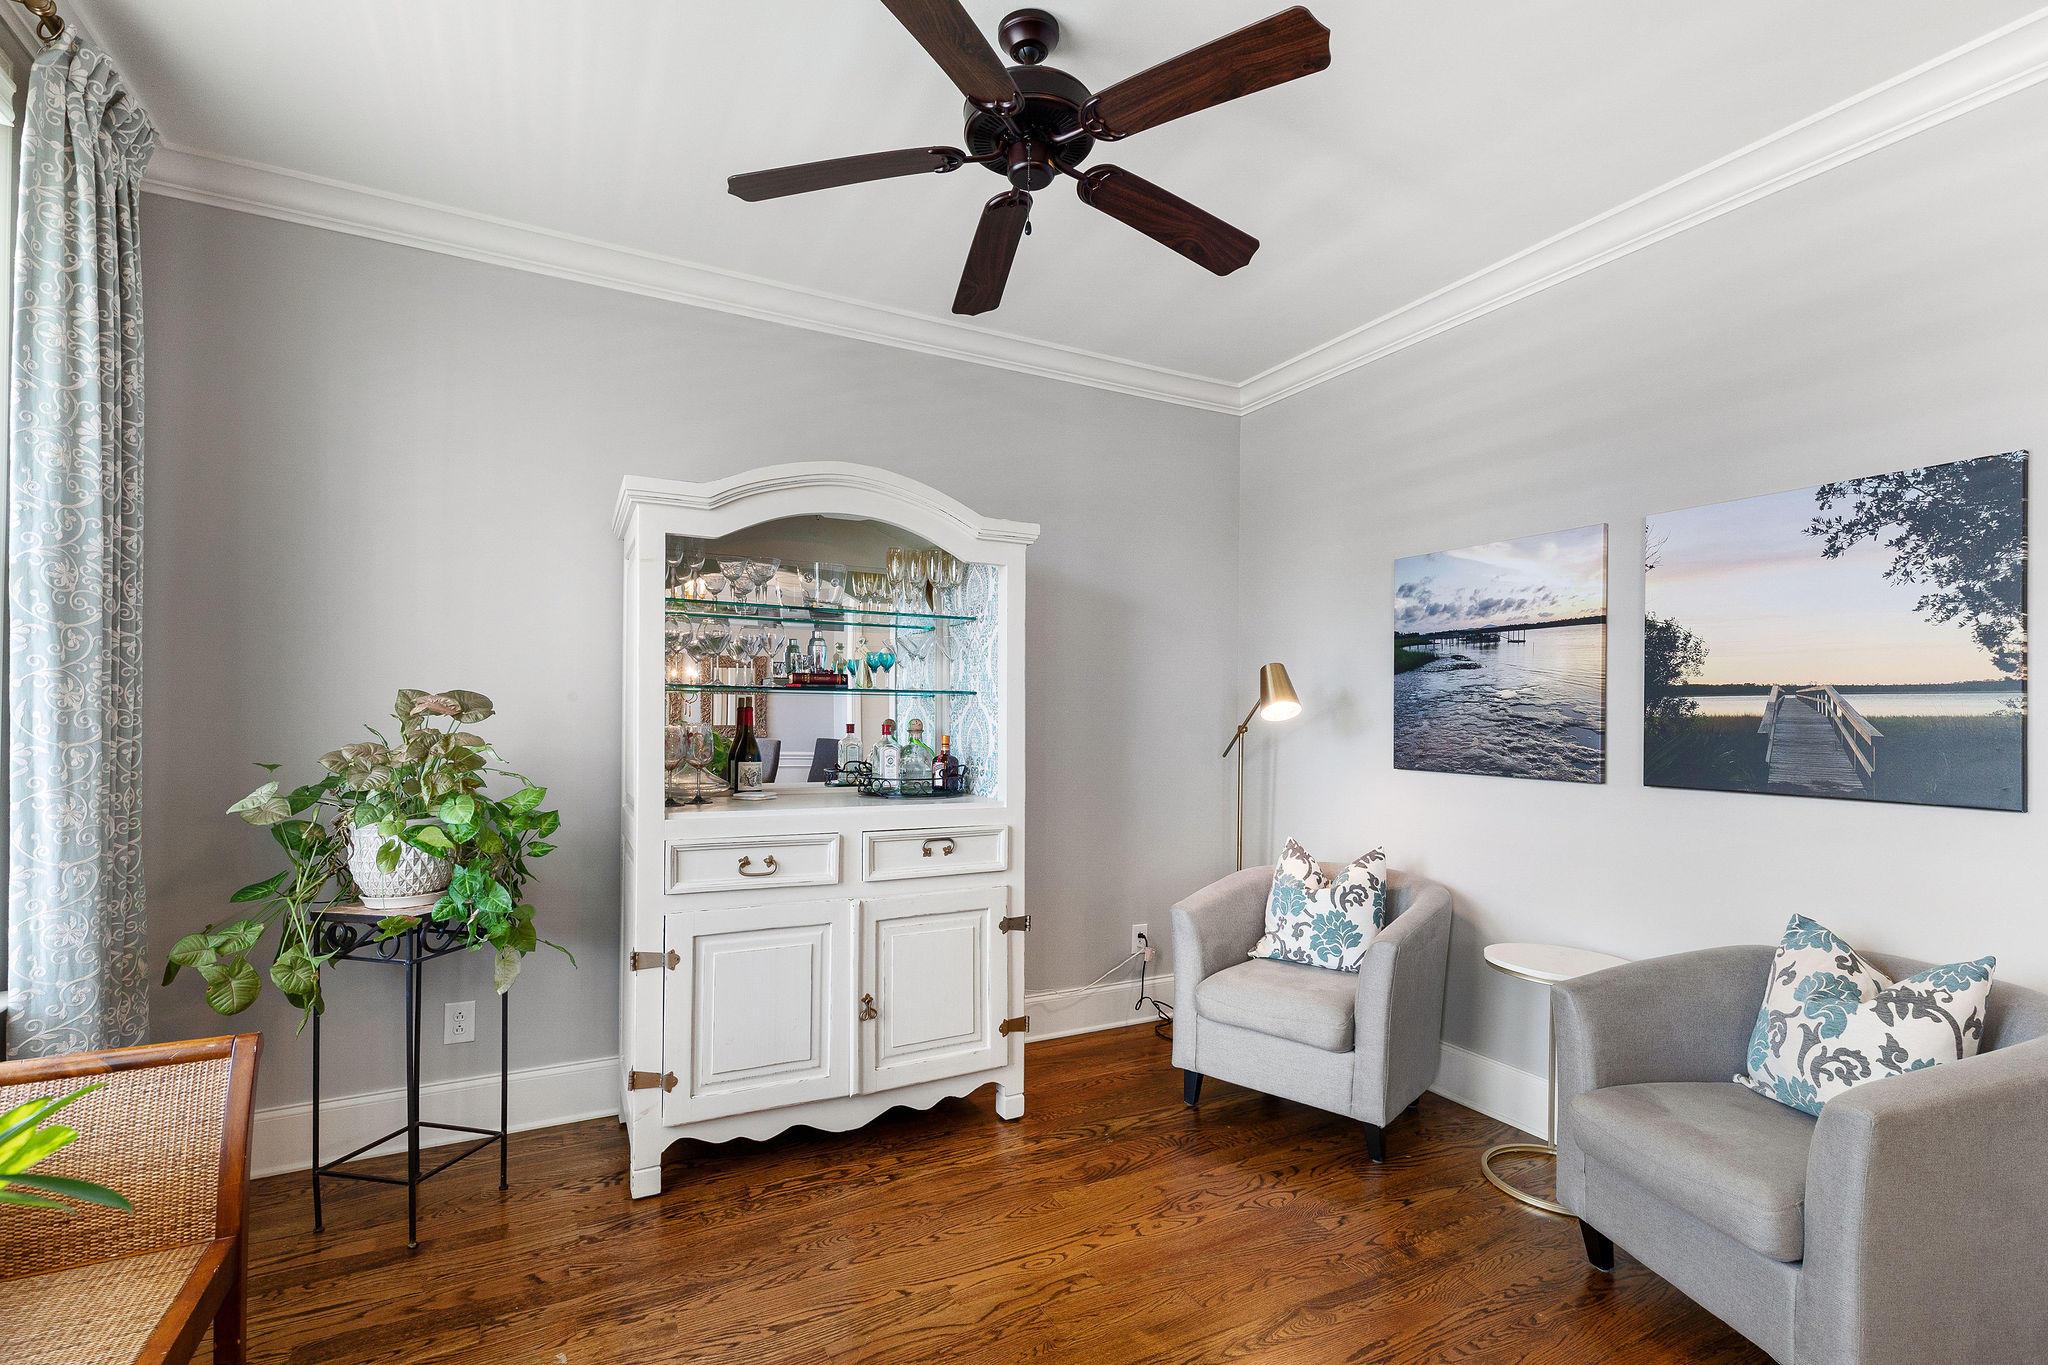 Dunes West Homes For Sale - 3212 Hatchway, Mount Pleasant, SC - 22